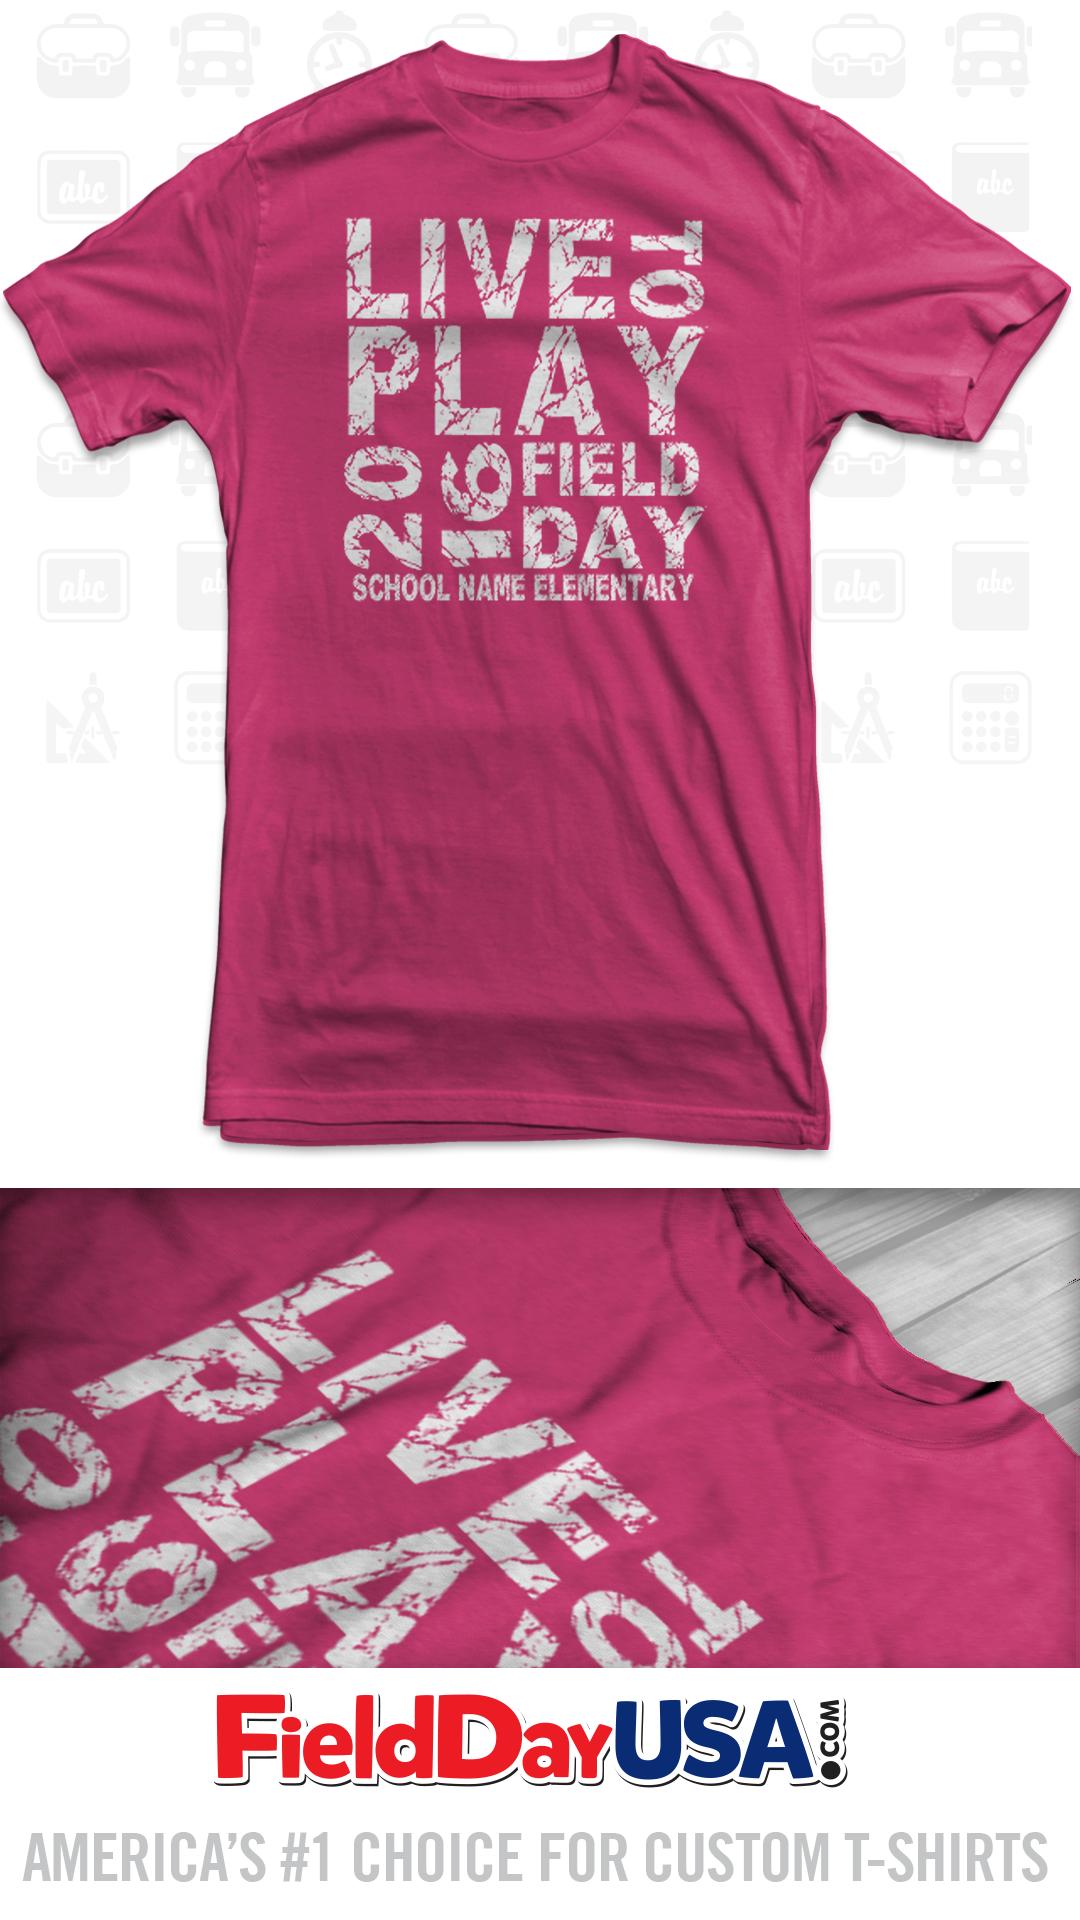 Budget Event Field Day TShirt Design BE1605 School